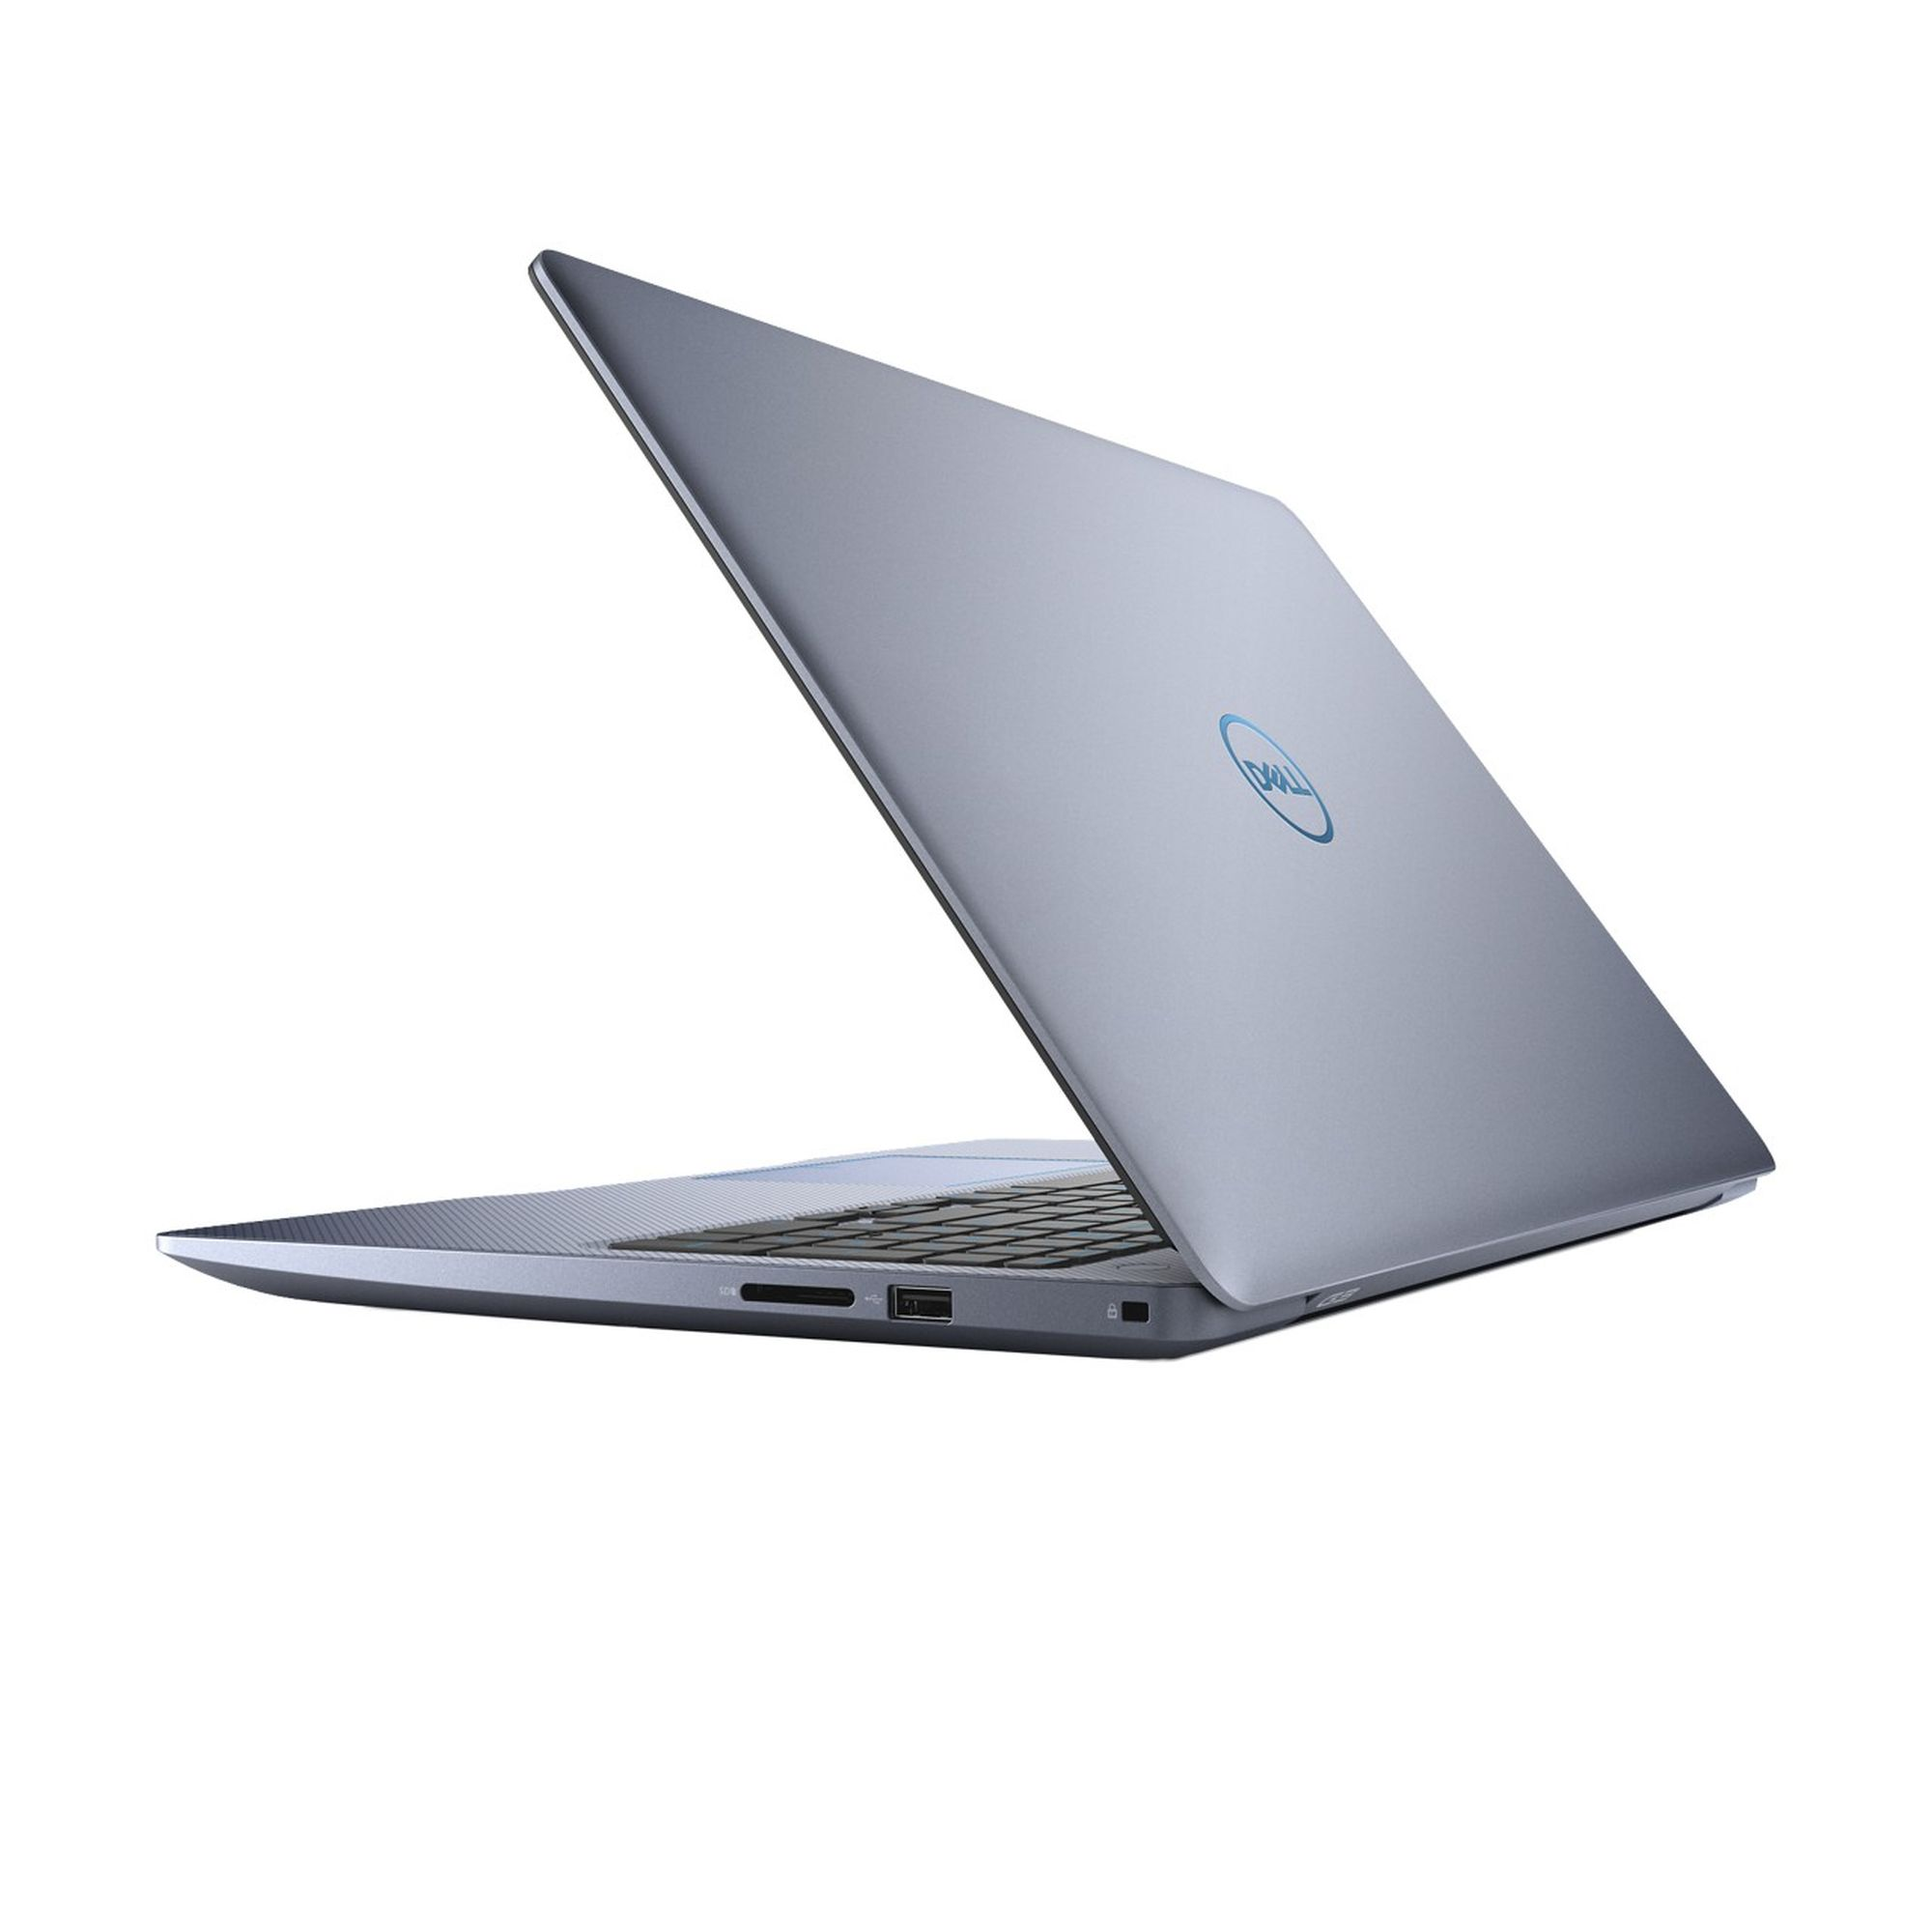 "DELL G3 15(3579)/i7-8750H/8GB/256GB SSD/15,6""/FHD/4GB Nvidia 1050Ti/Win10 64bit/modrý"